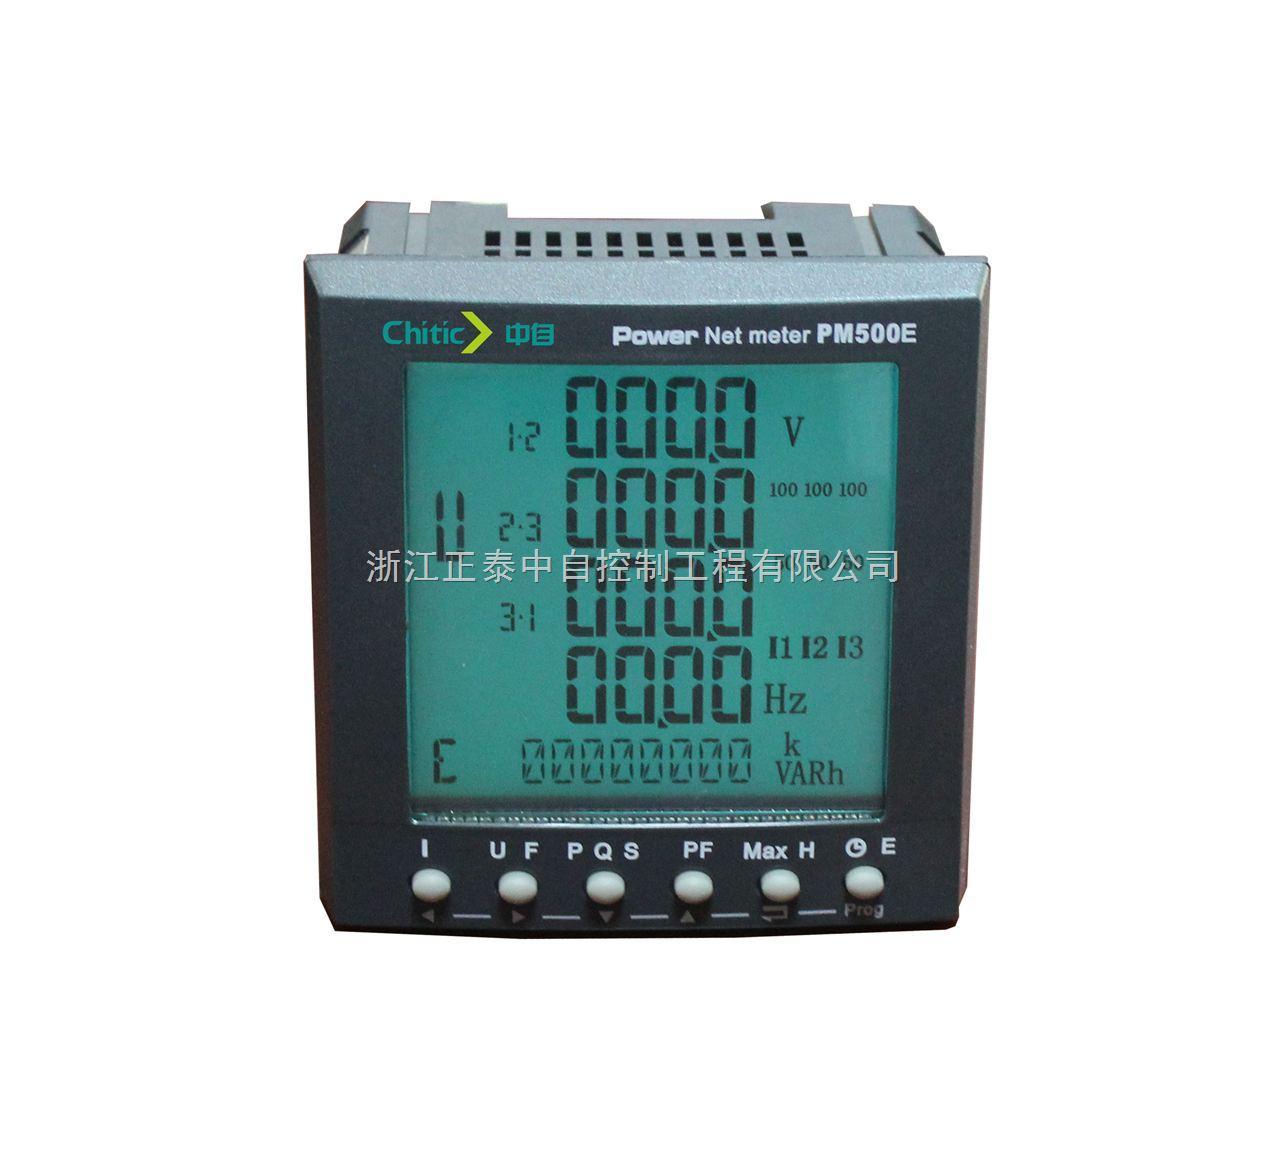 PM500E智能网络电力测控仪可测量单相和三相电网的全部电参数,具有测量控制、显示、谐波分析,最大值记录等功能,通过插入不同的功能模块,可实现MODBUS-RS485通信、DC4-20mA模拟量输出、开关量输入输出、谐波测量、脉冲输出等功能。